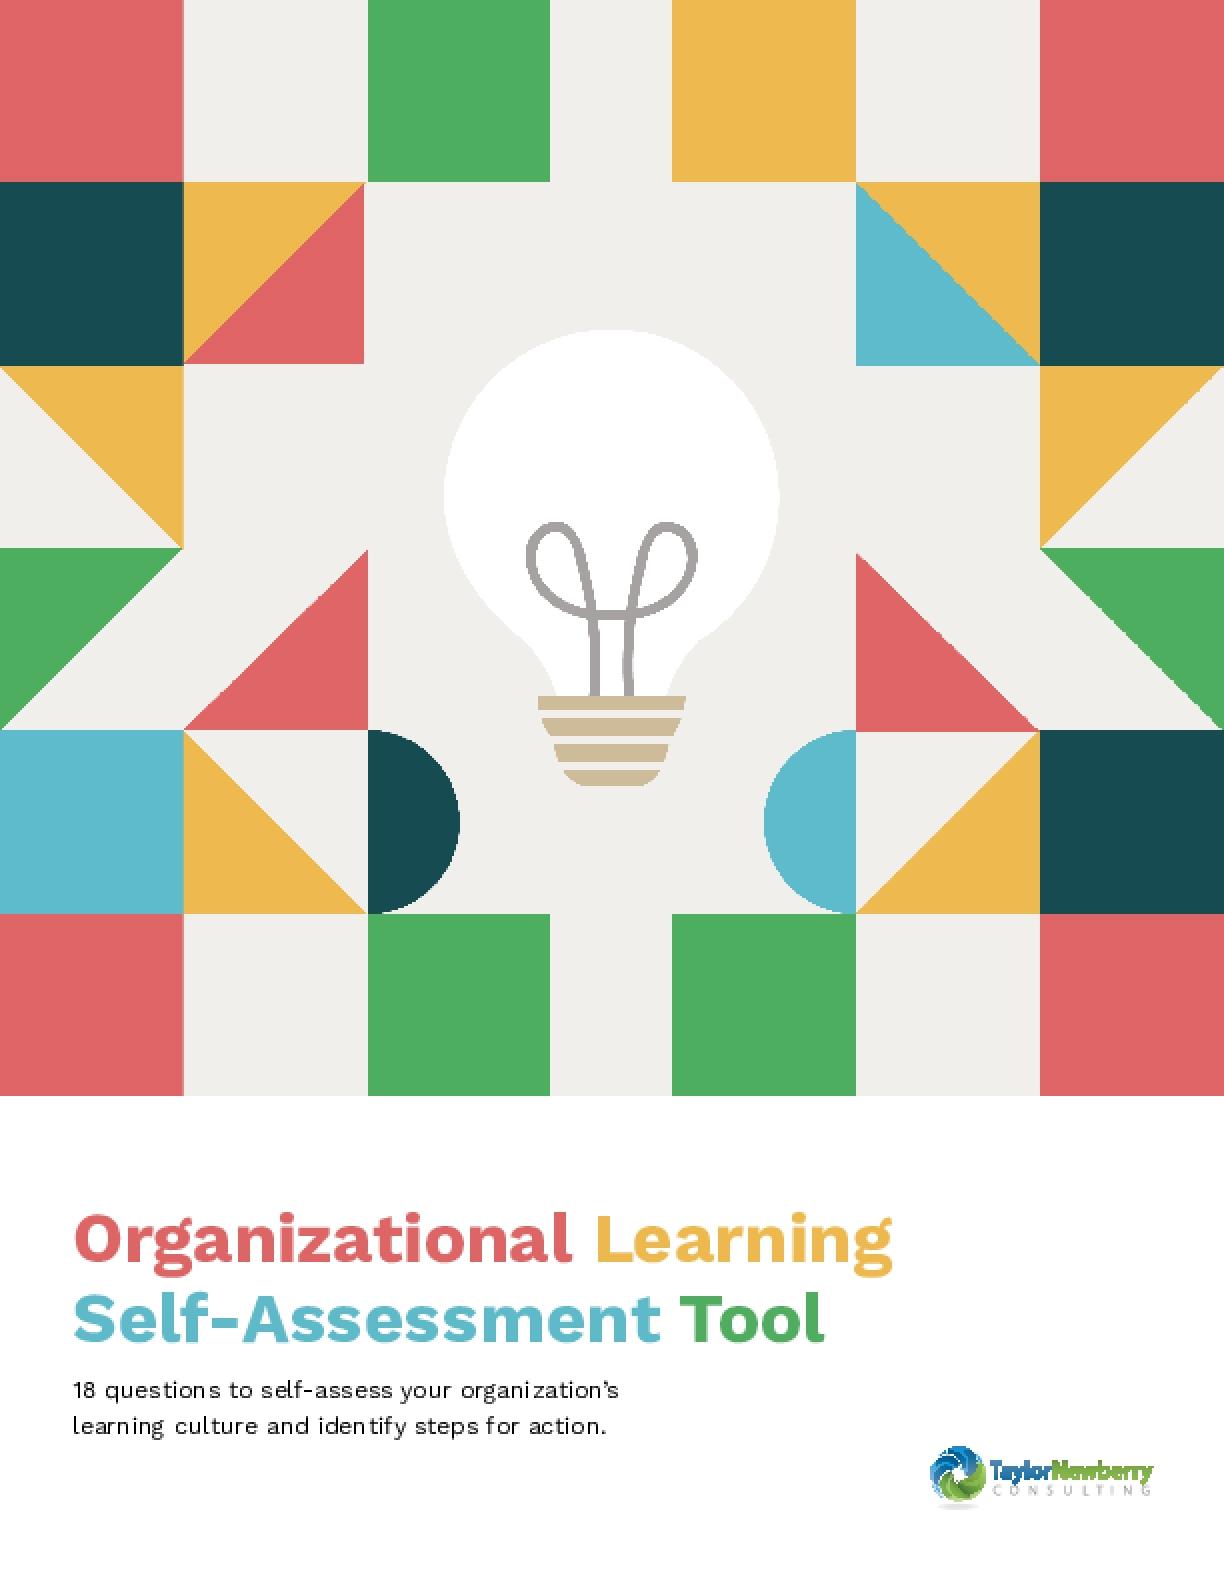 Organizational Learning Self-Assessment Tool